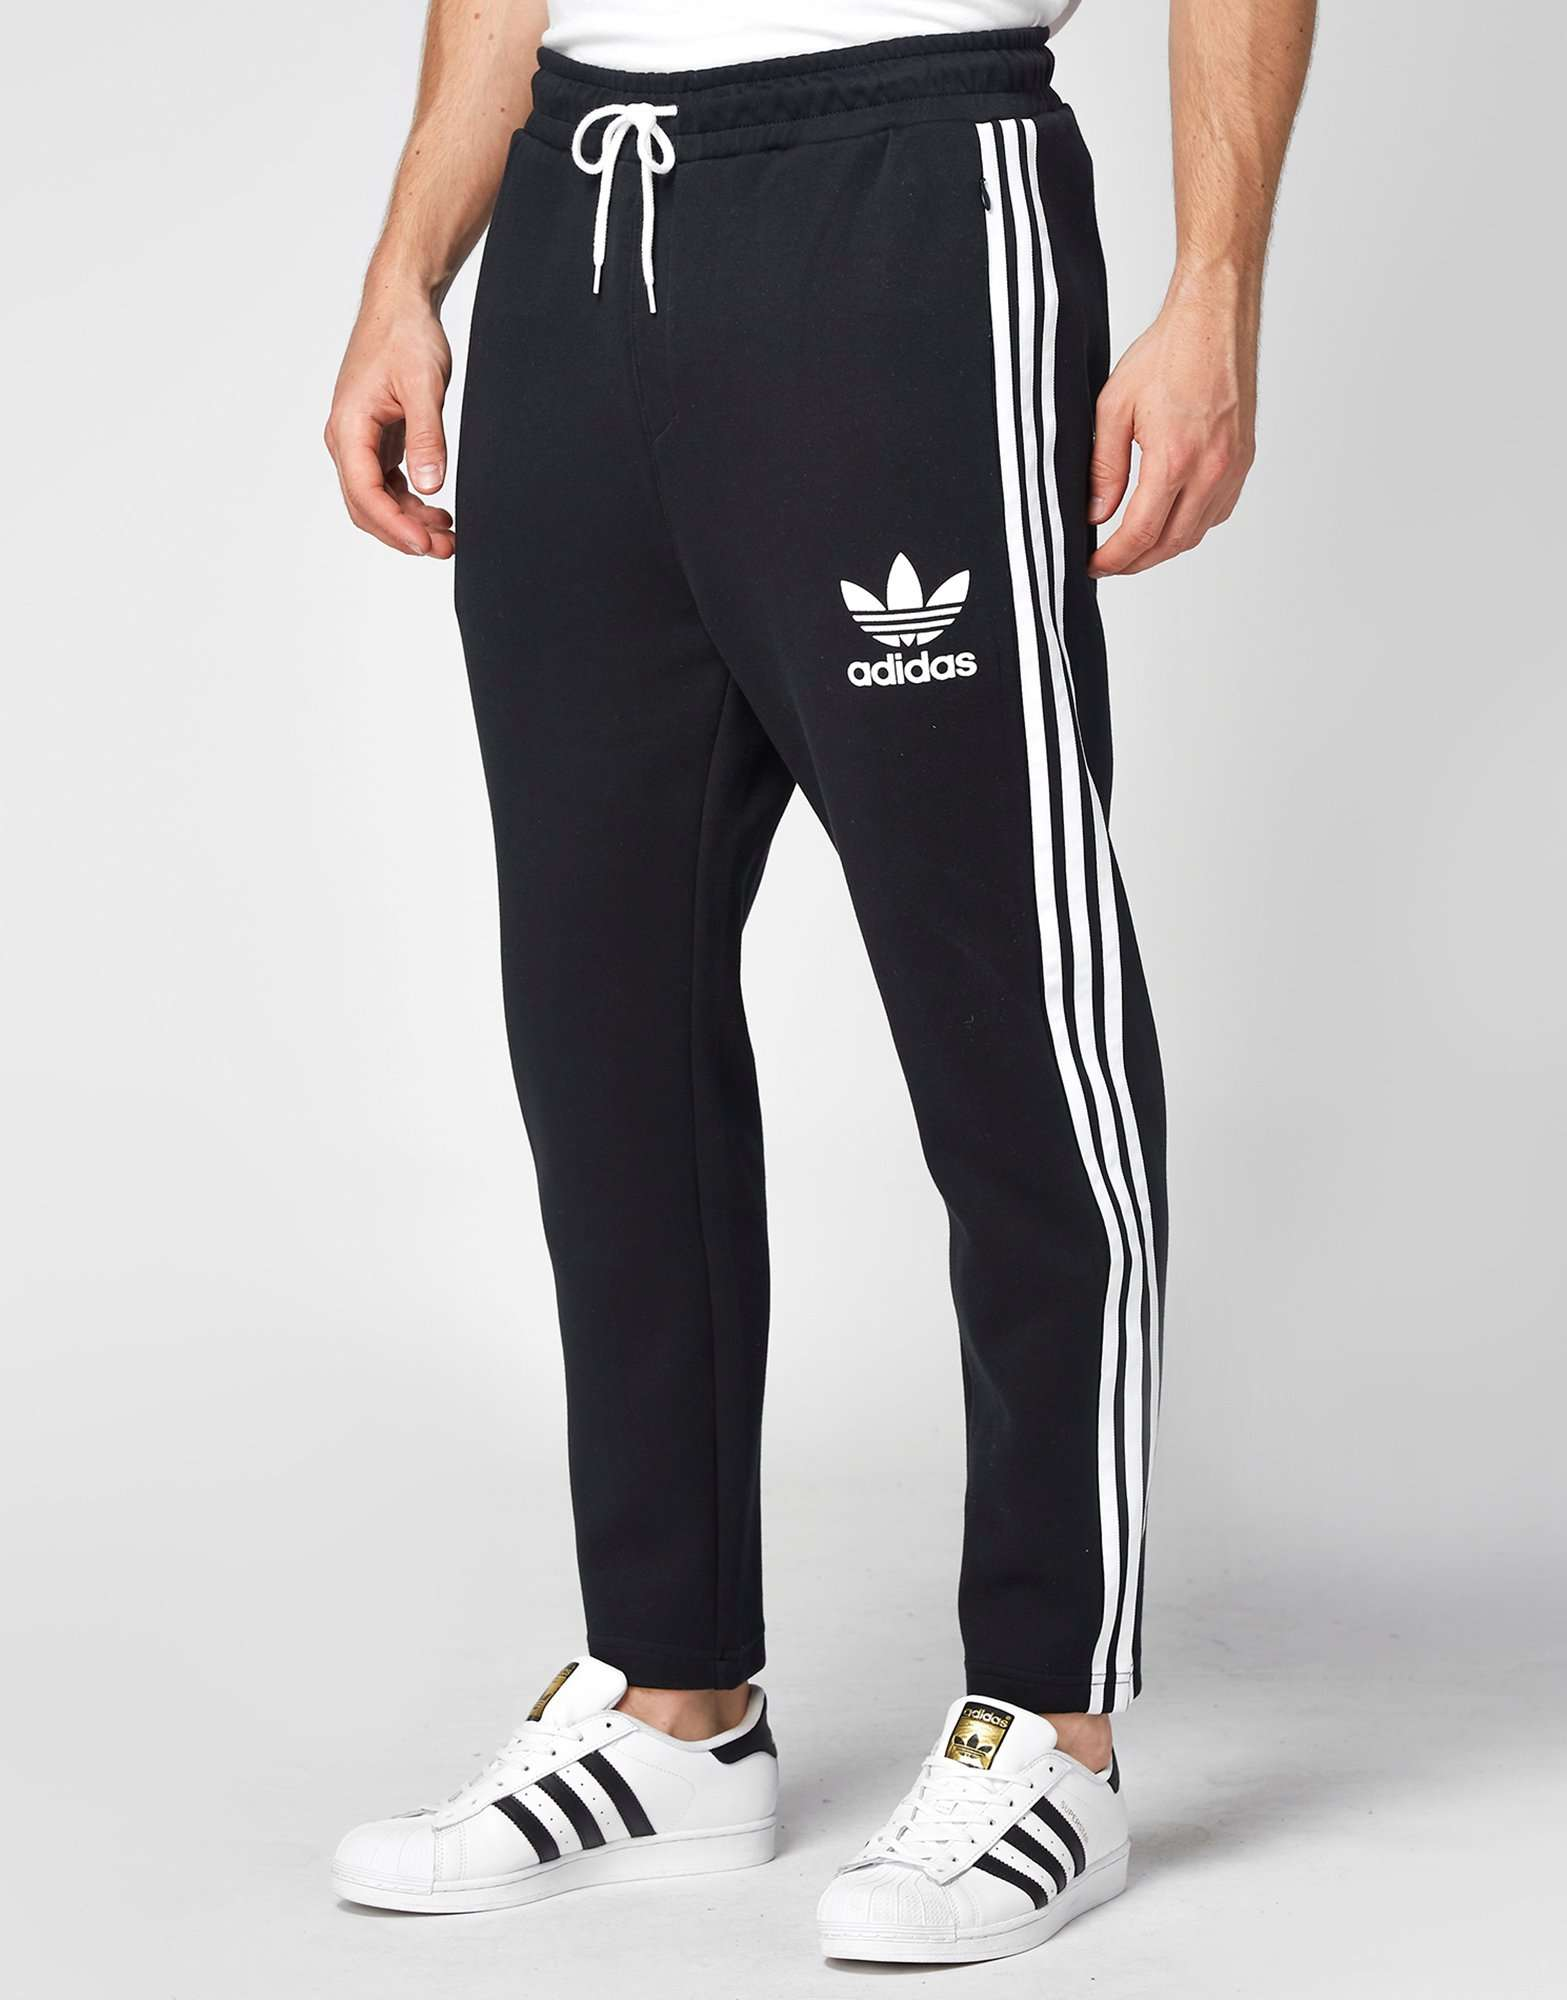 adidas originals adicolor skinny track pants scotts menswear